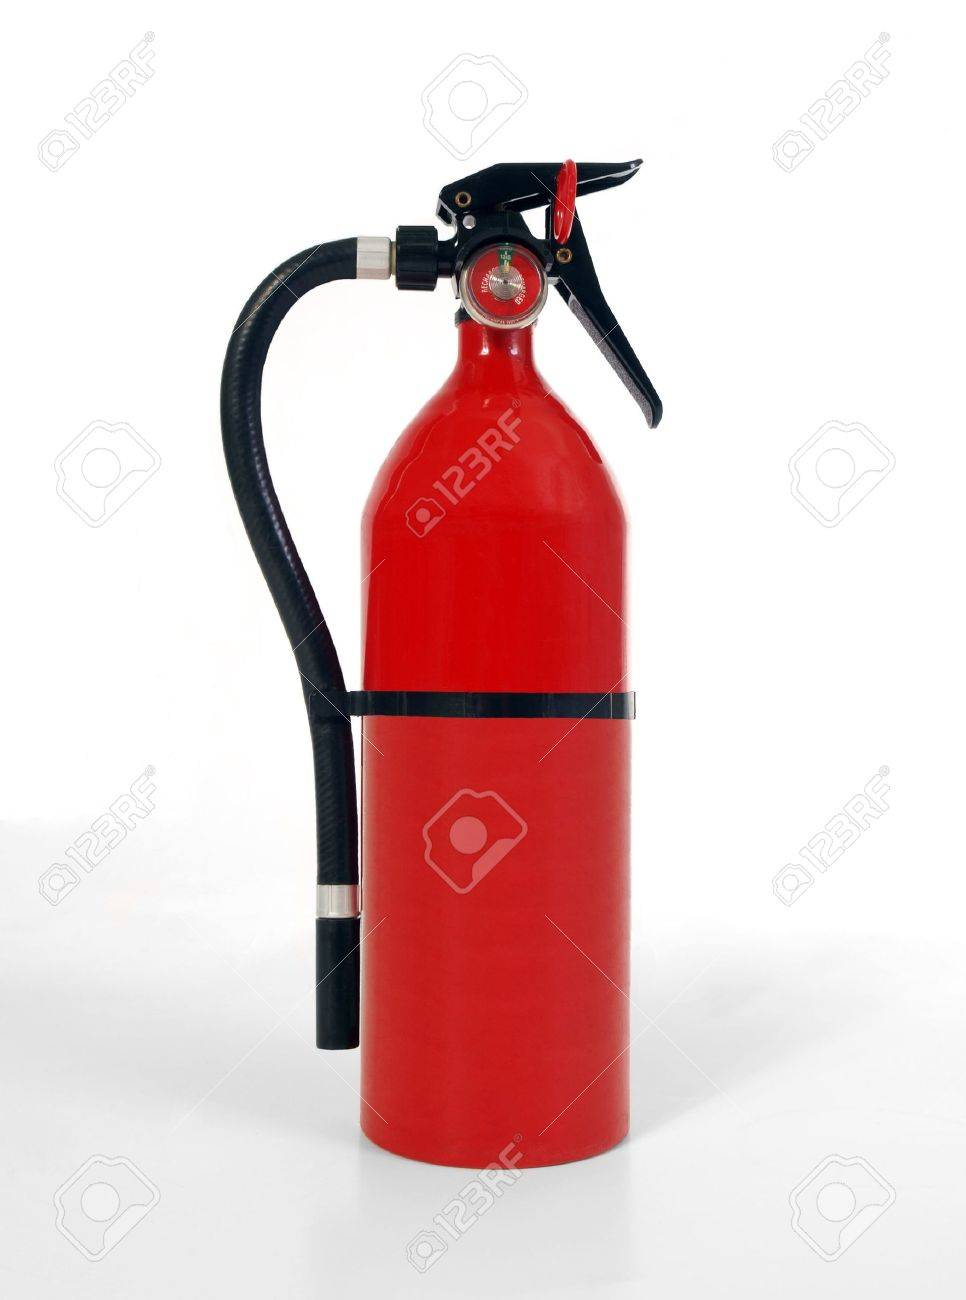 Shiny, new, home fire extinguisher.  Shot on white. Stock Photo - 6700097